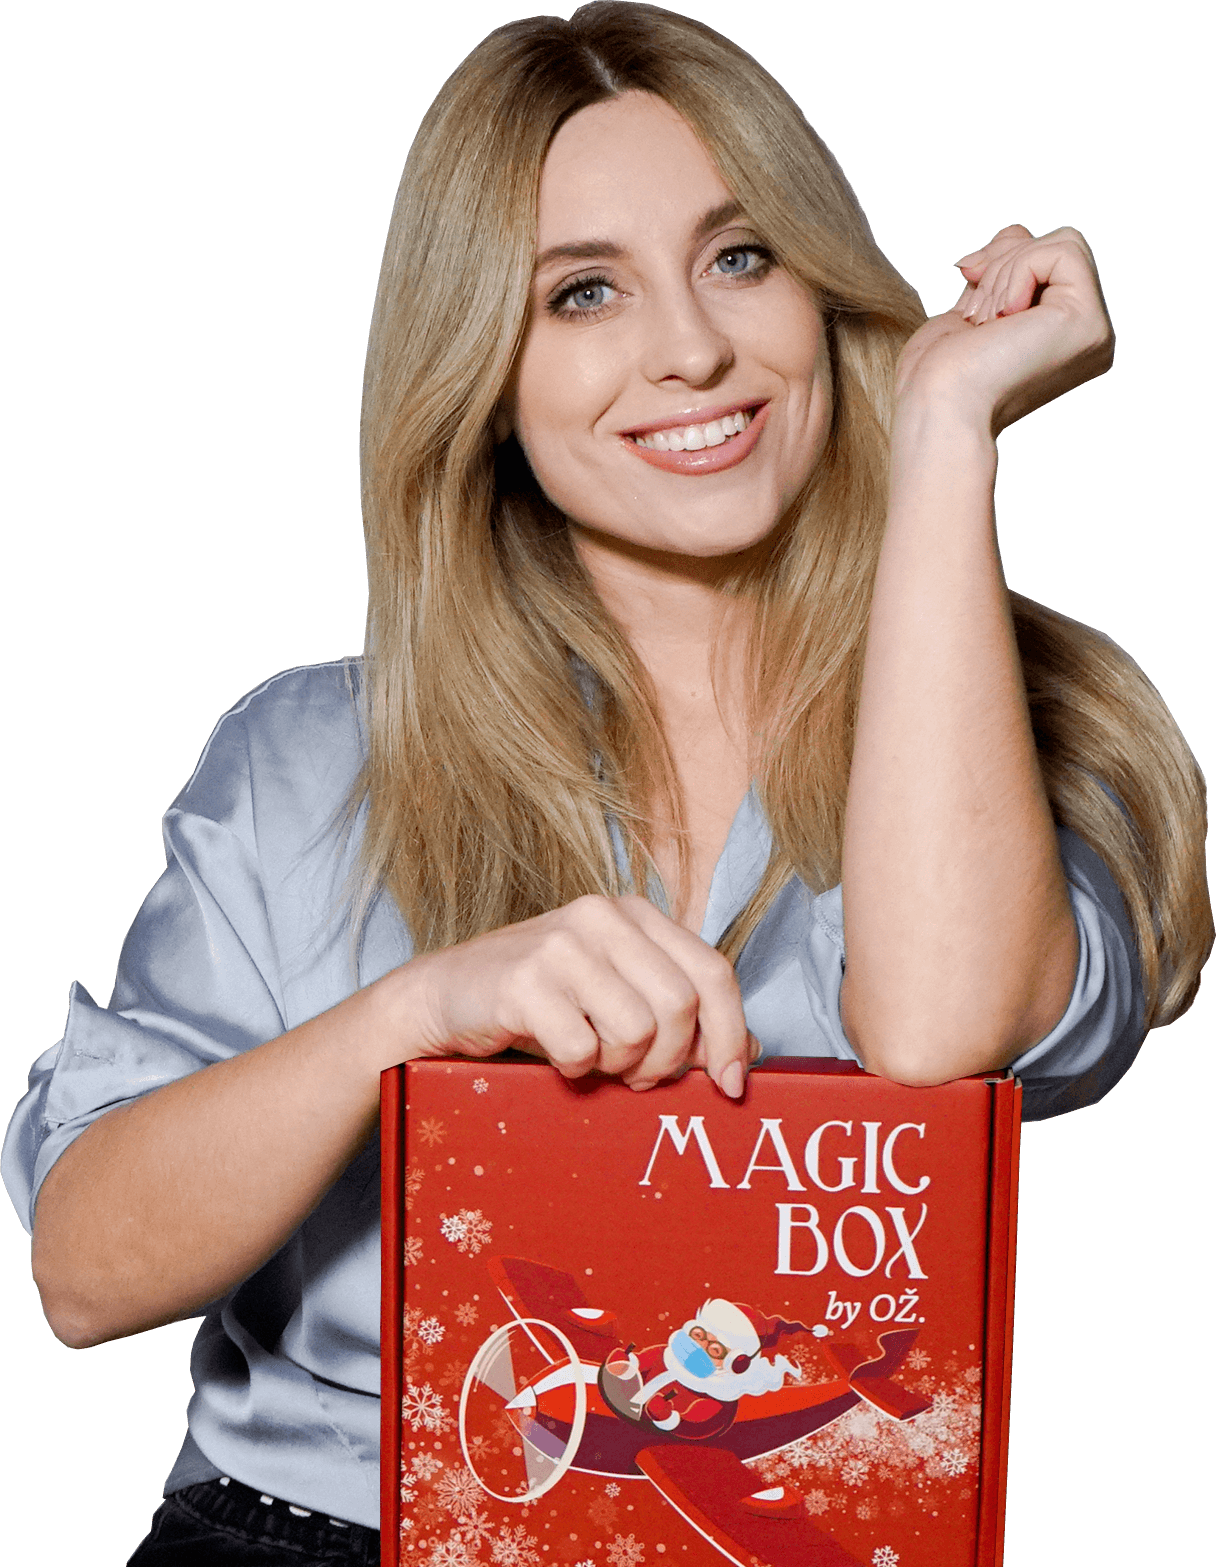 Magic Box by OŽ, Olesia Žuravliova, OŽ Design Home